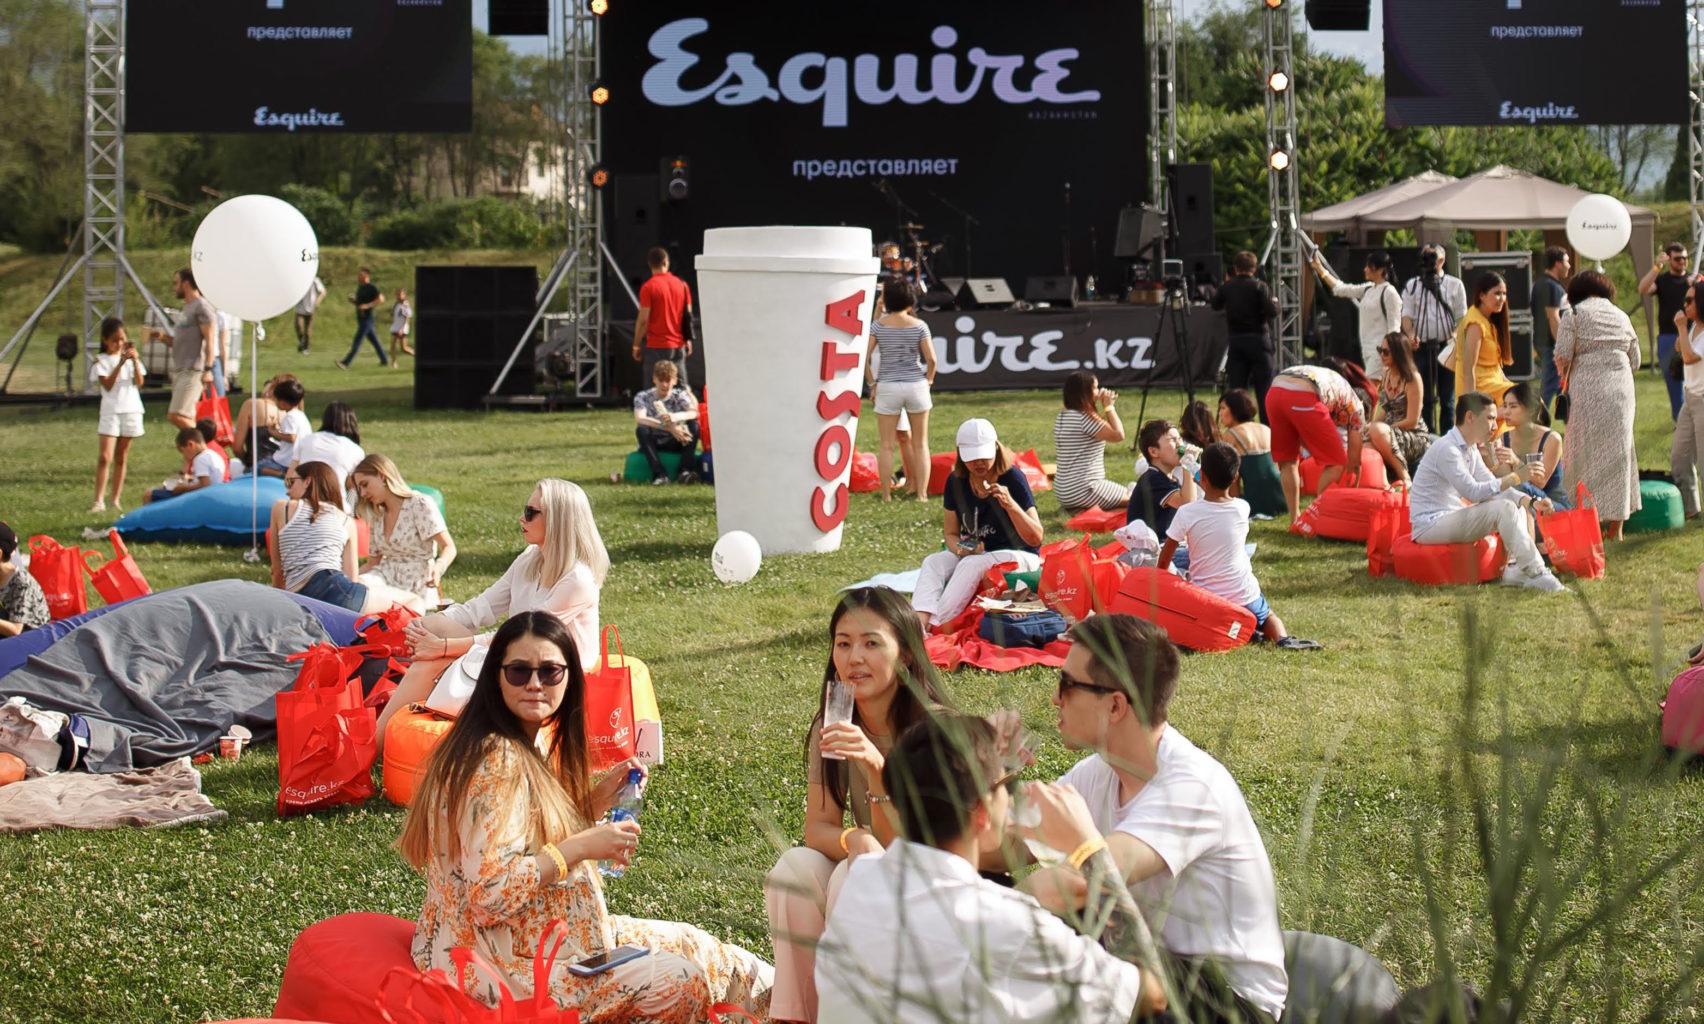 Пикник Esquire 2019: фотоотчет